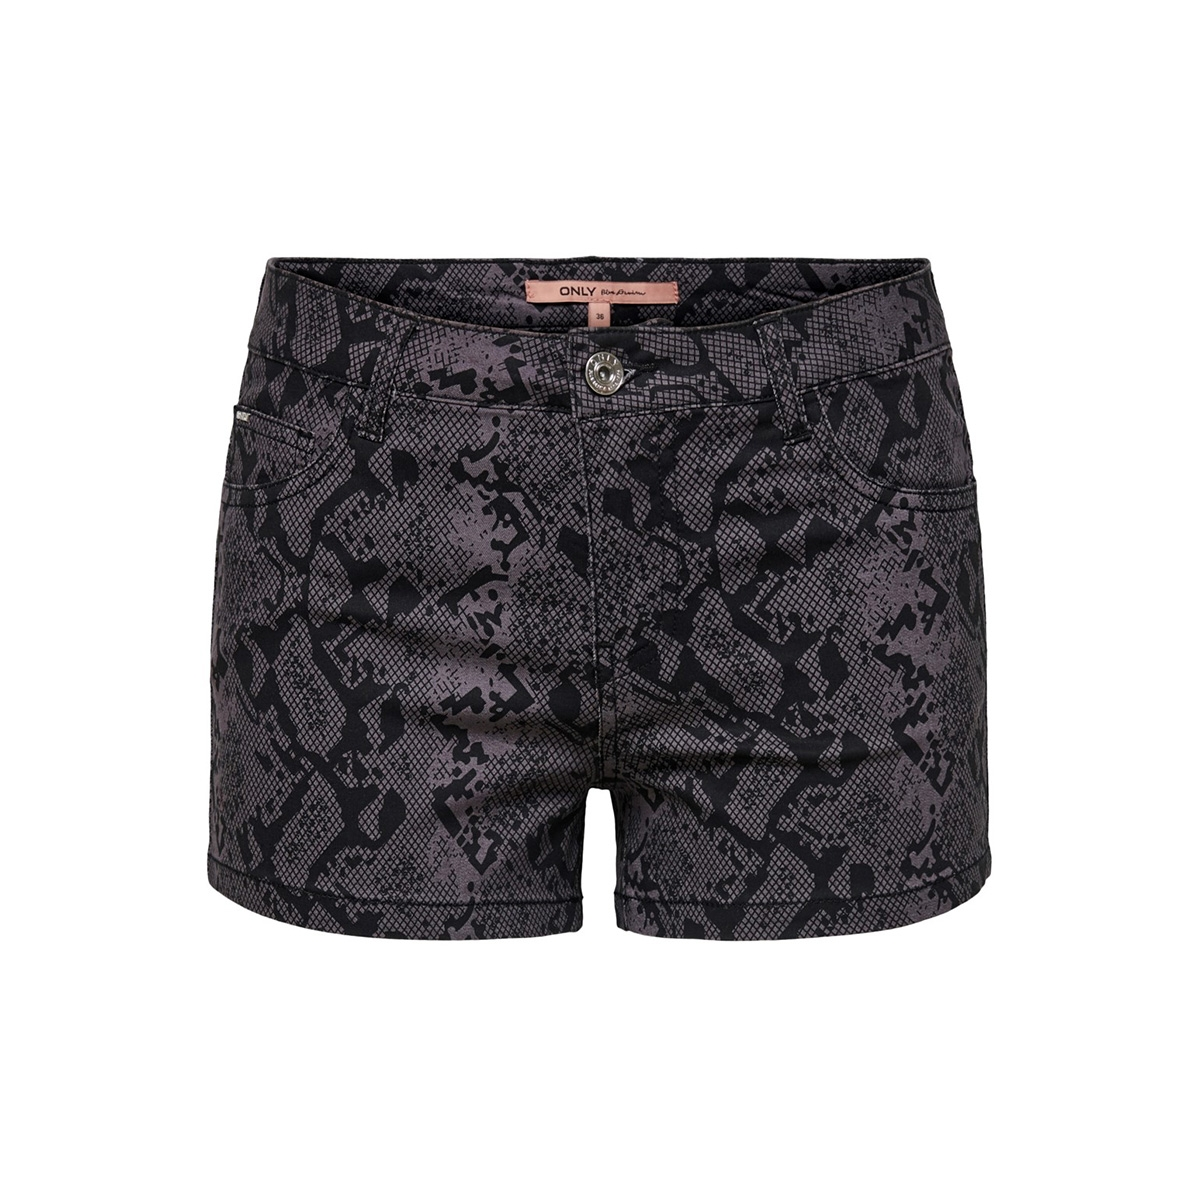 onlannika reg summer print shorts p 15176800 only korte broek black/snake